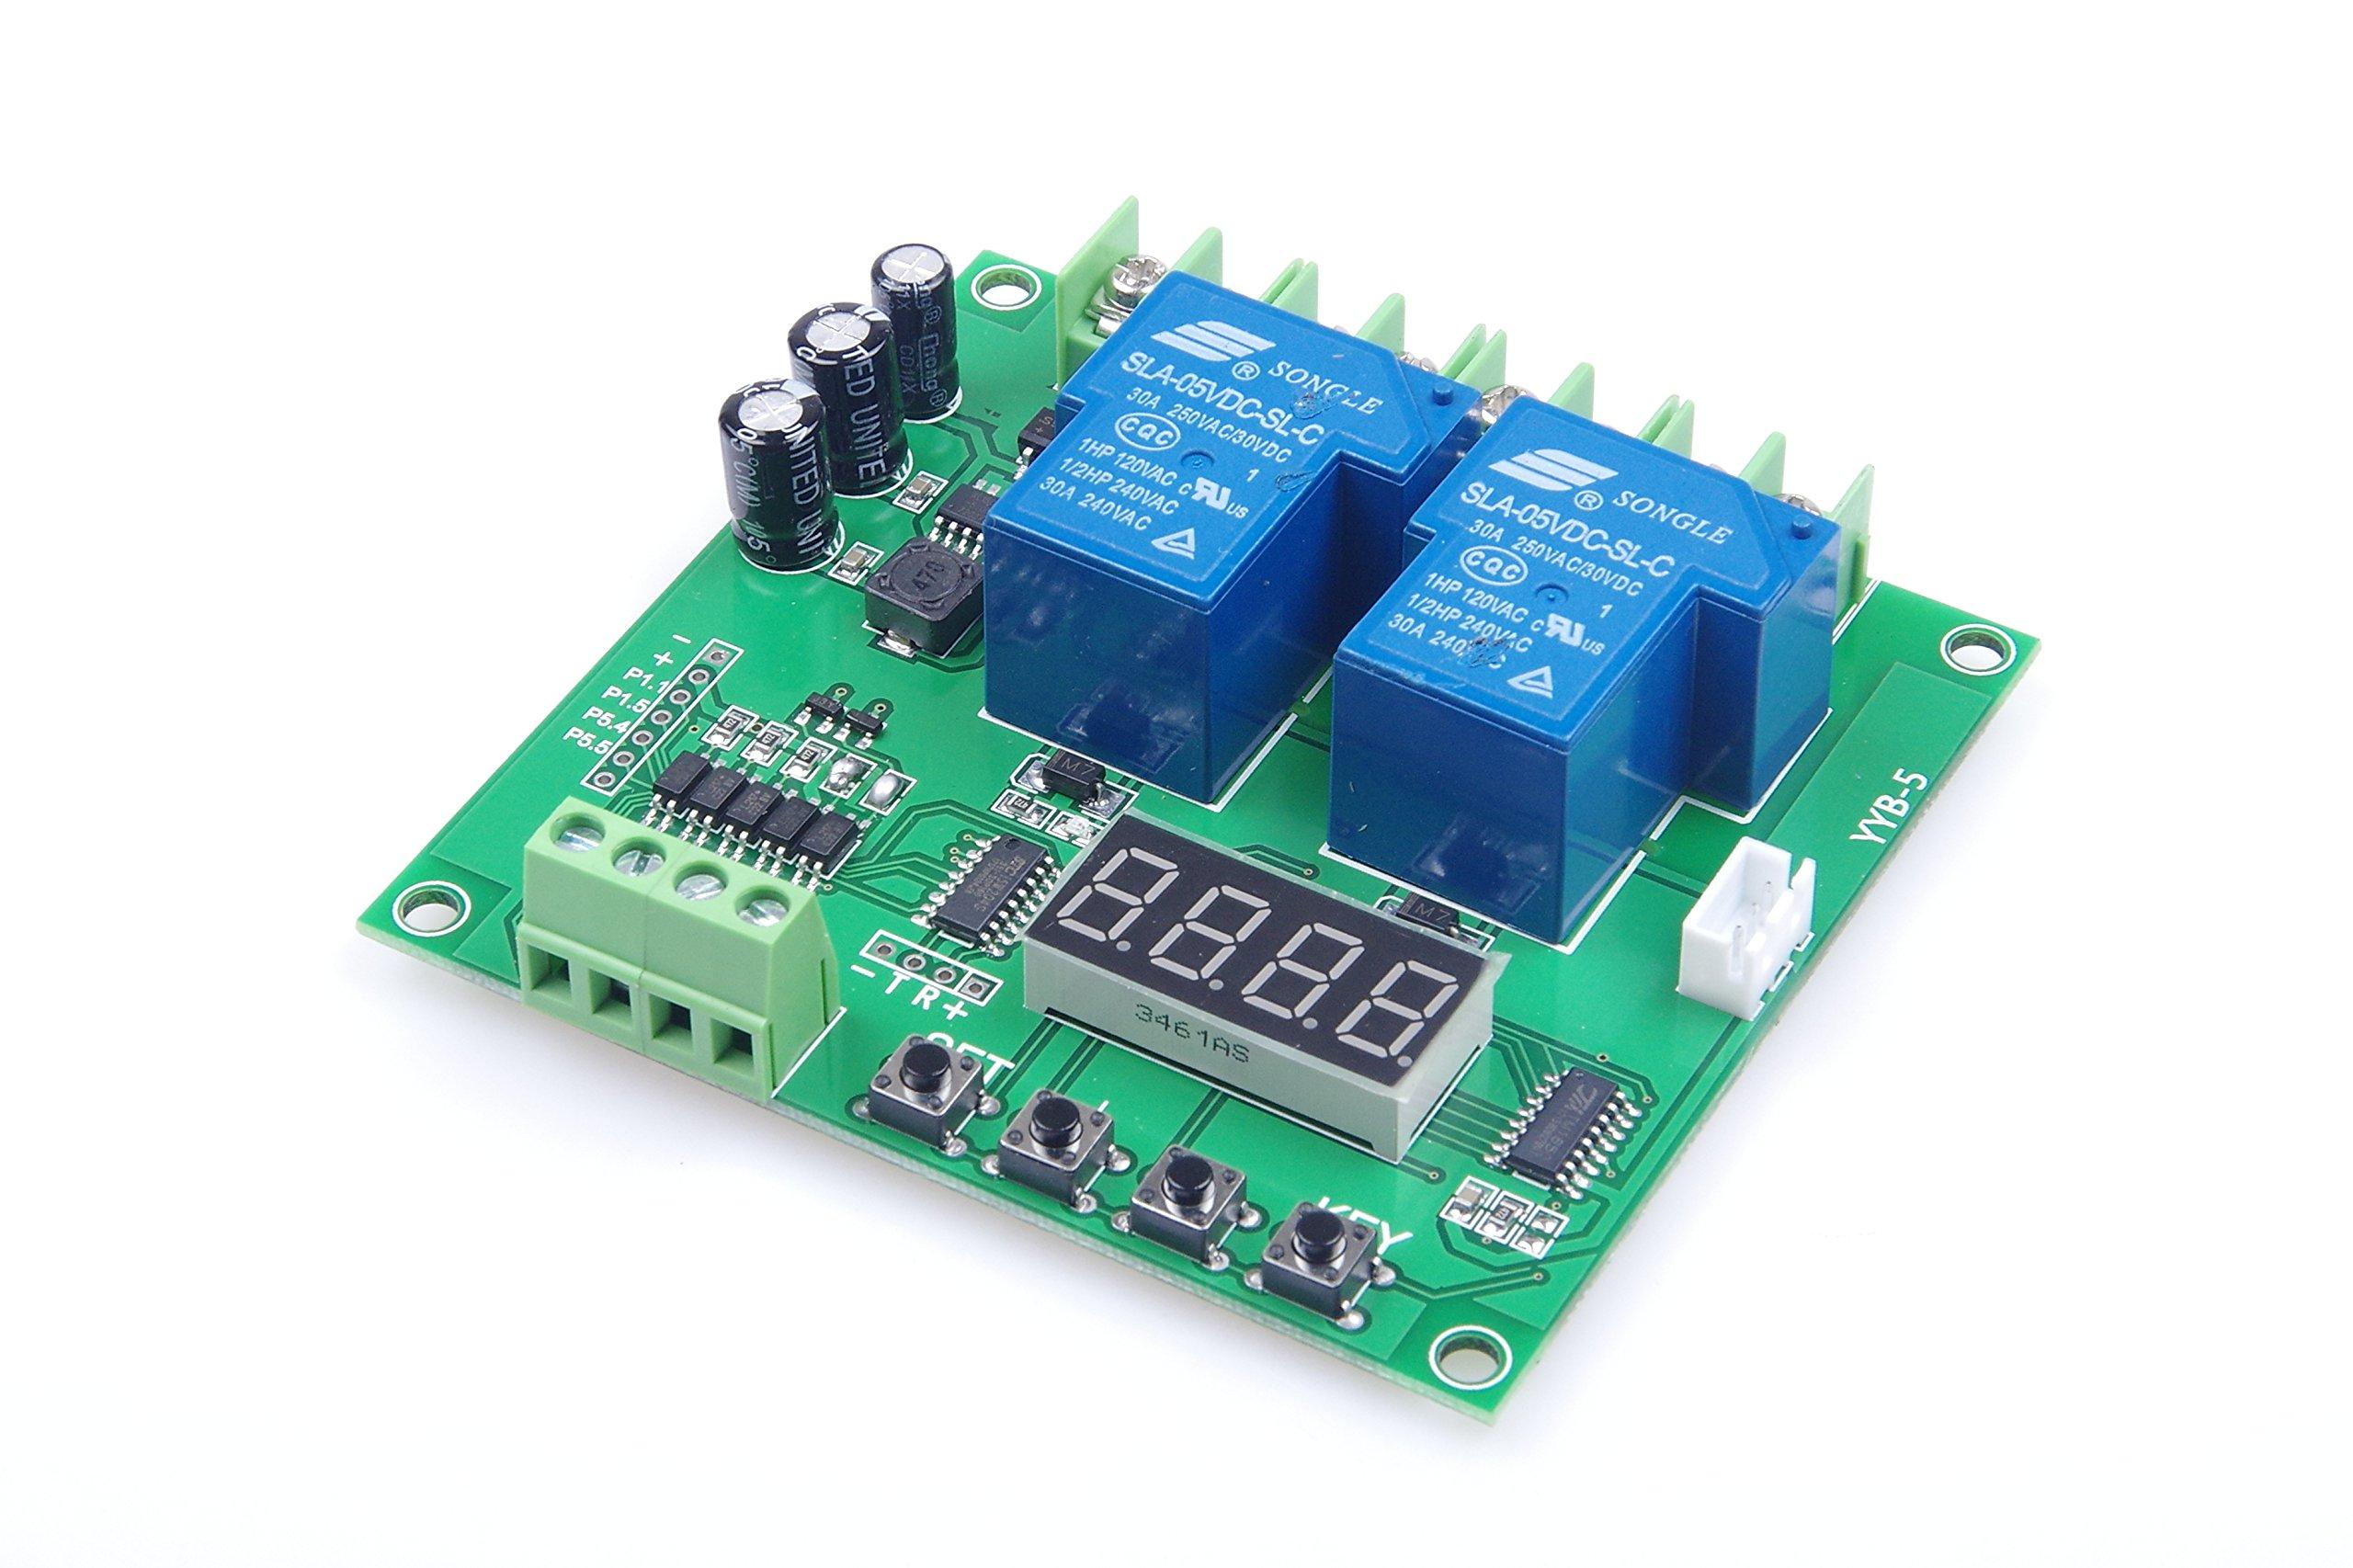 YAVO 2-Channel Motor Forward Reverse Relay Control Module AC / DC 12V 24V (7V-27V) 30A 0.1s-999 min Adjustable Digital Display Suitable for the control of 2-way solenoid valve, pumps, motors, lights